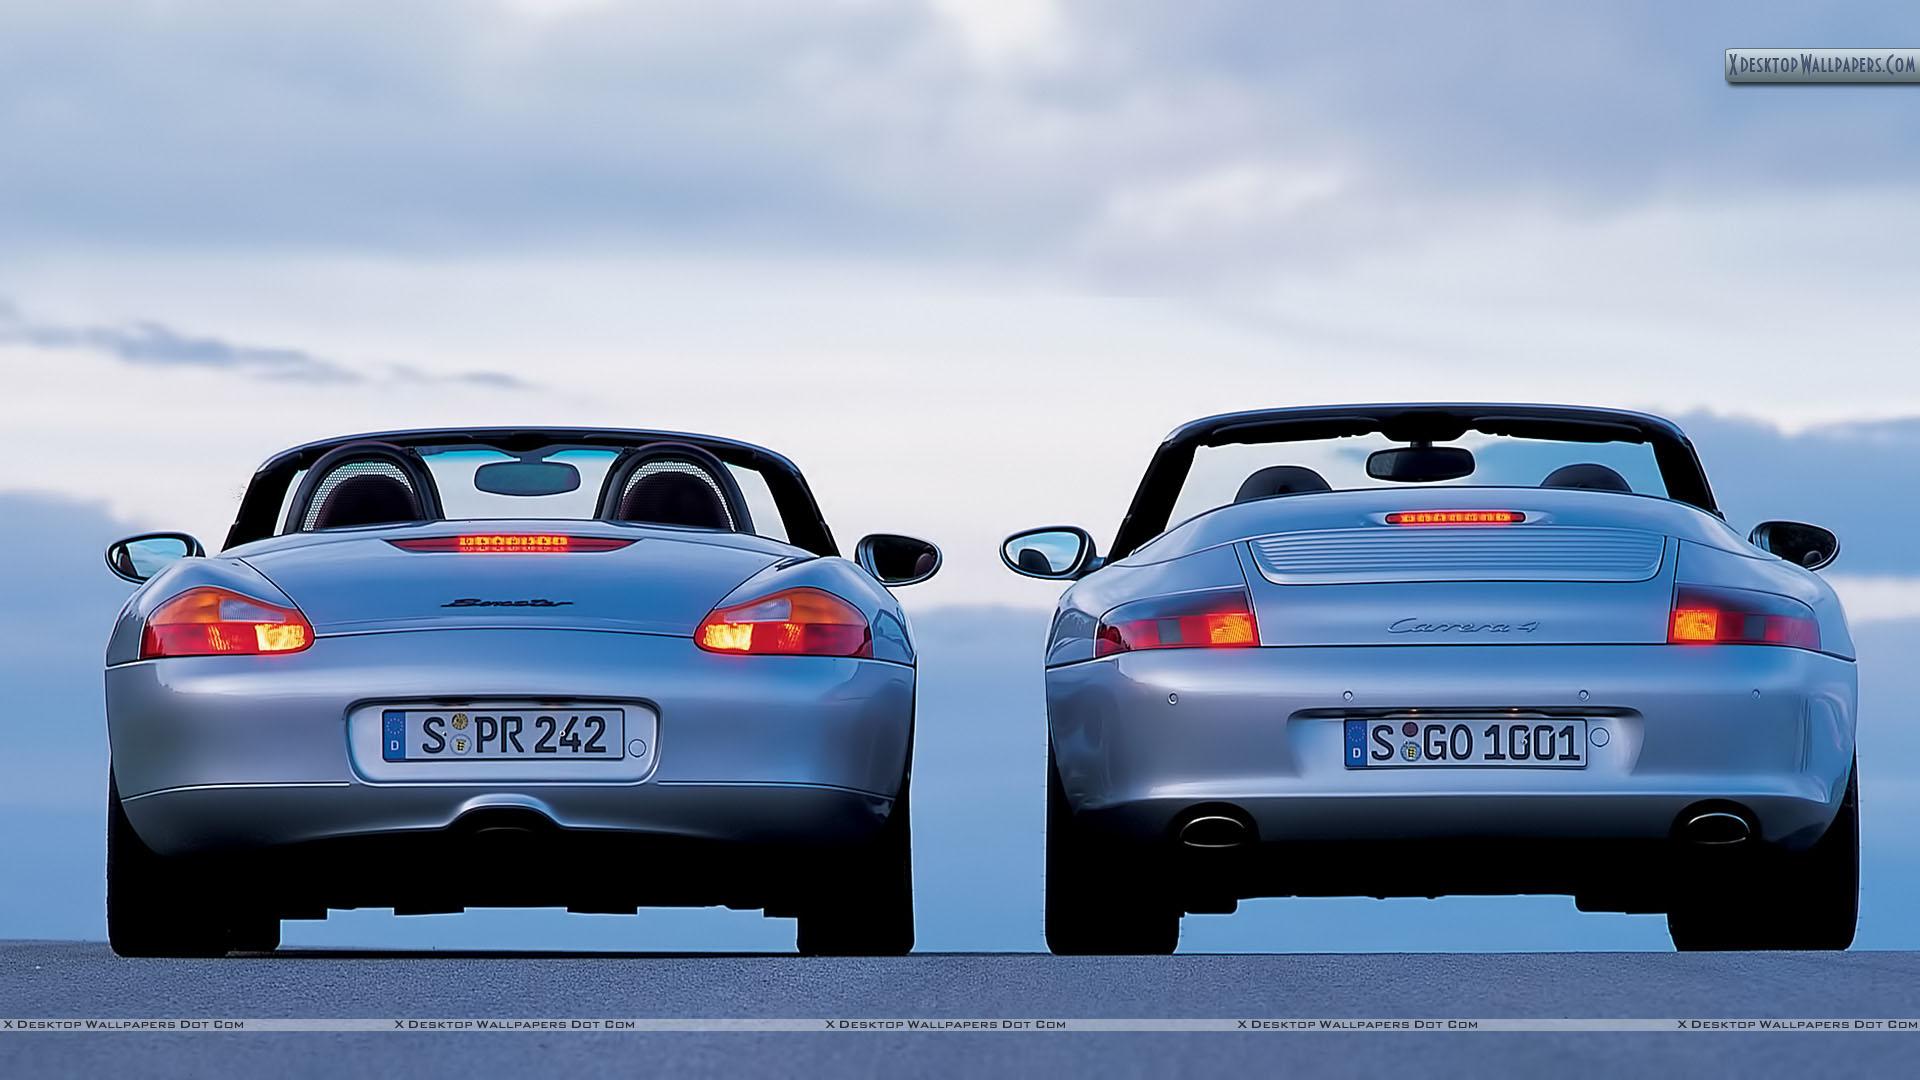 Porsche Boxster And 911 Cabriolet Wallpaper 1920x1080